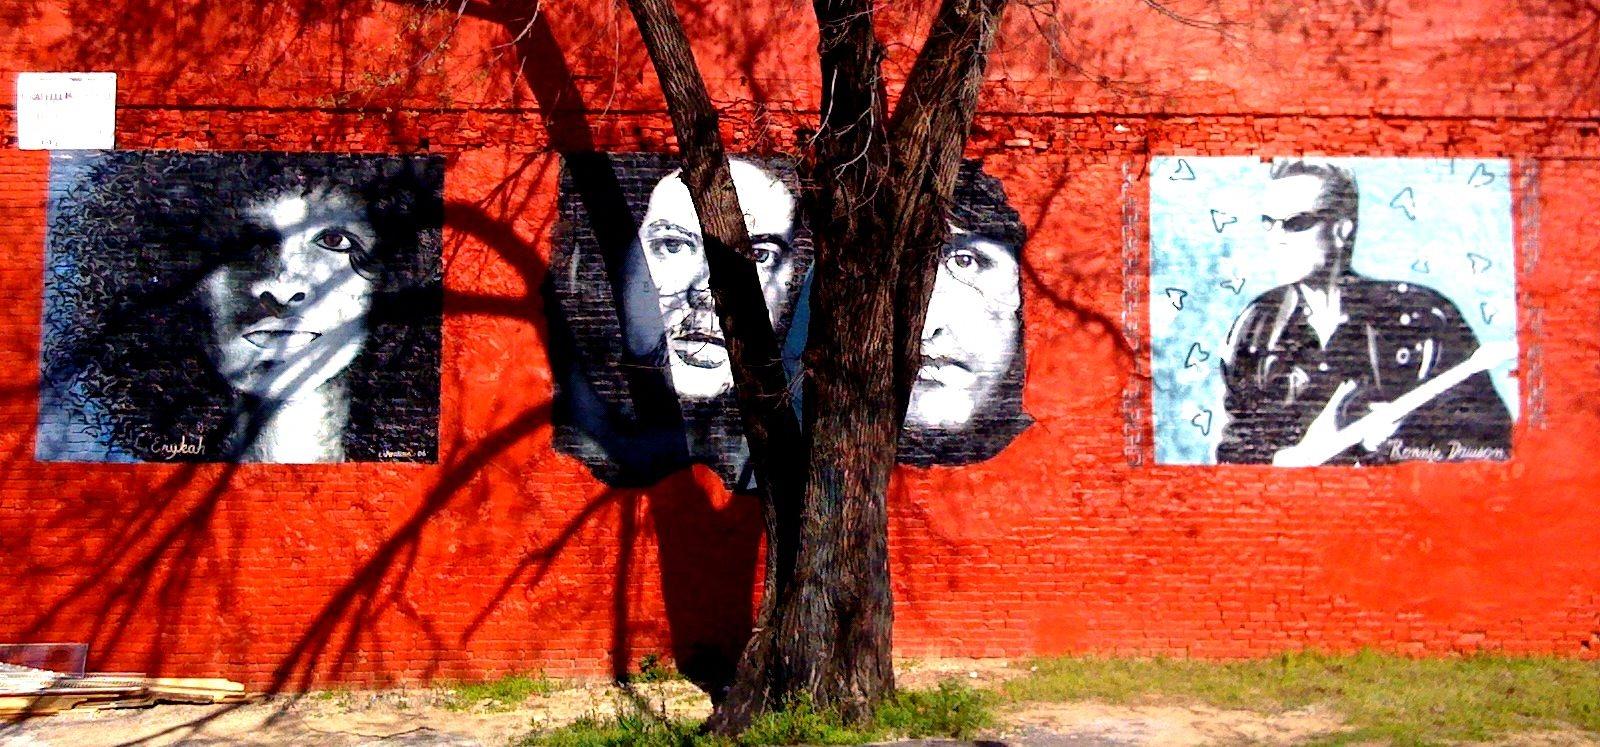 Deep Ellum Mural at 3333 Elm Street Lofts in Deep Ellum, Dallas, TX